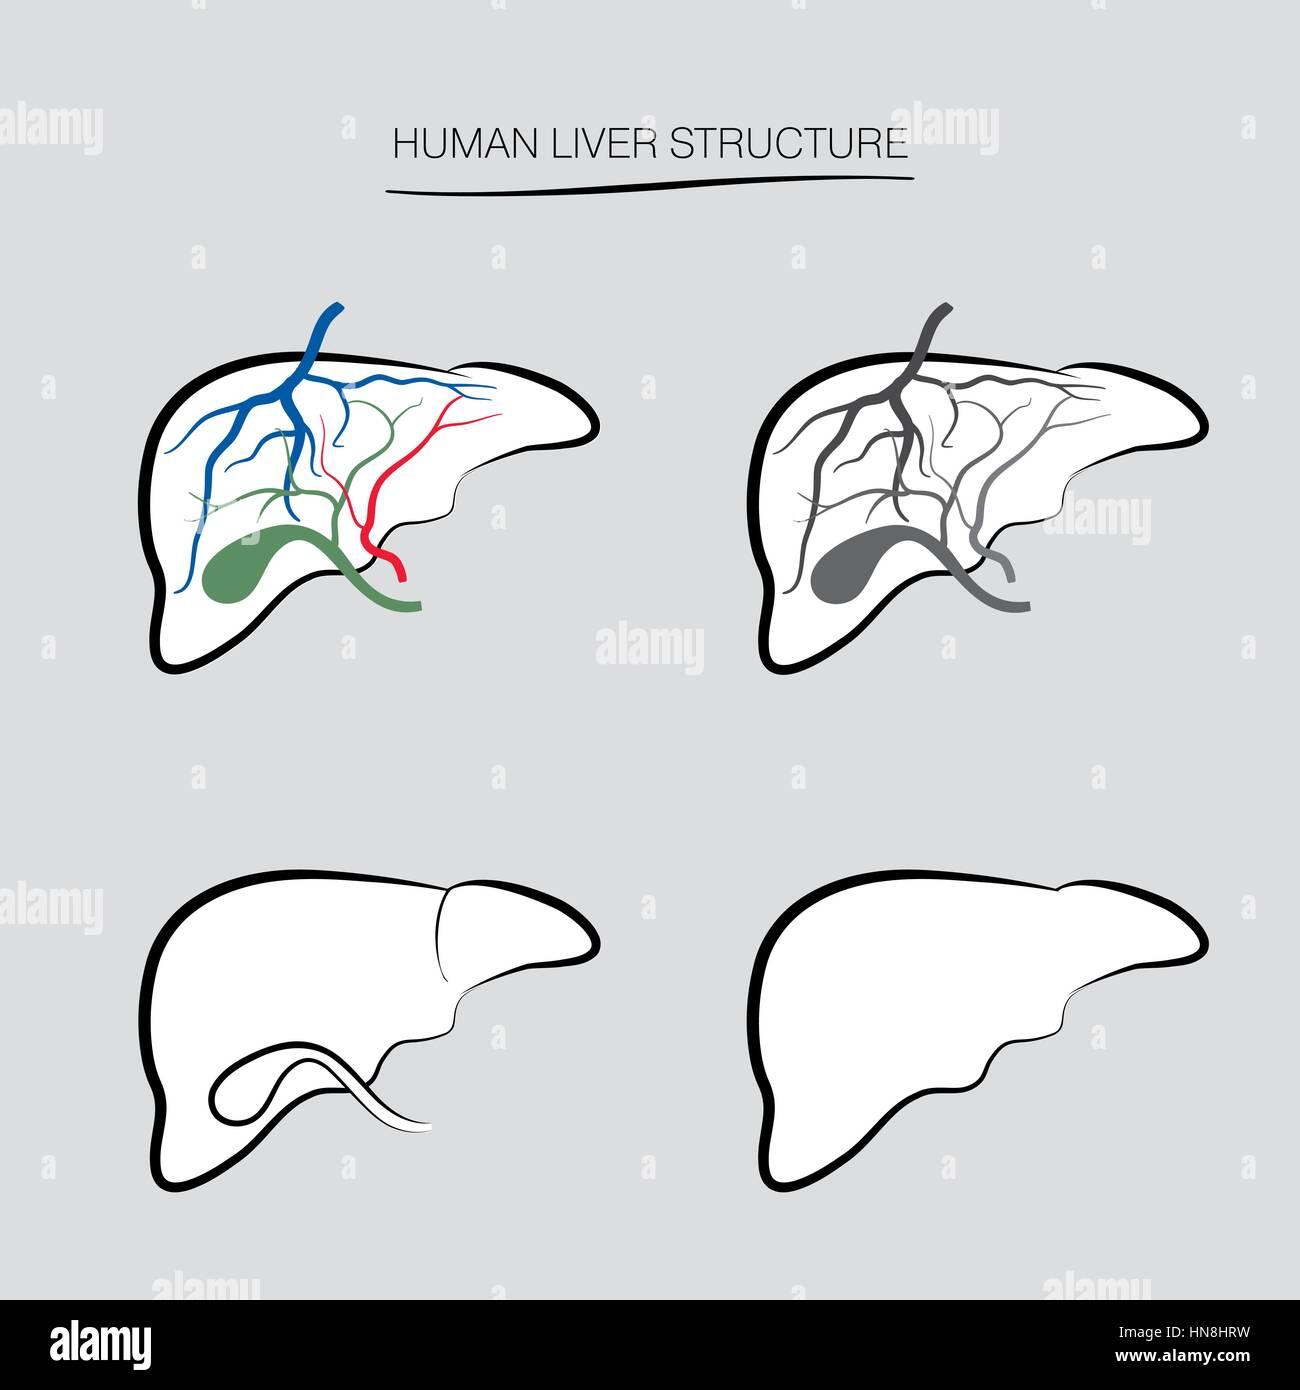 Human liver structure. Human internal organ icons set - Stock Image